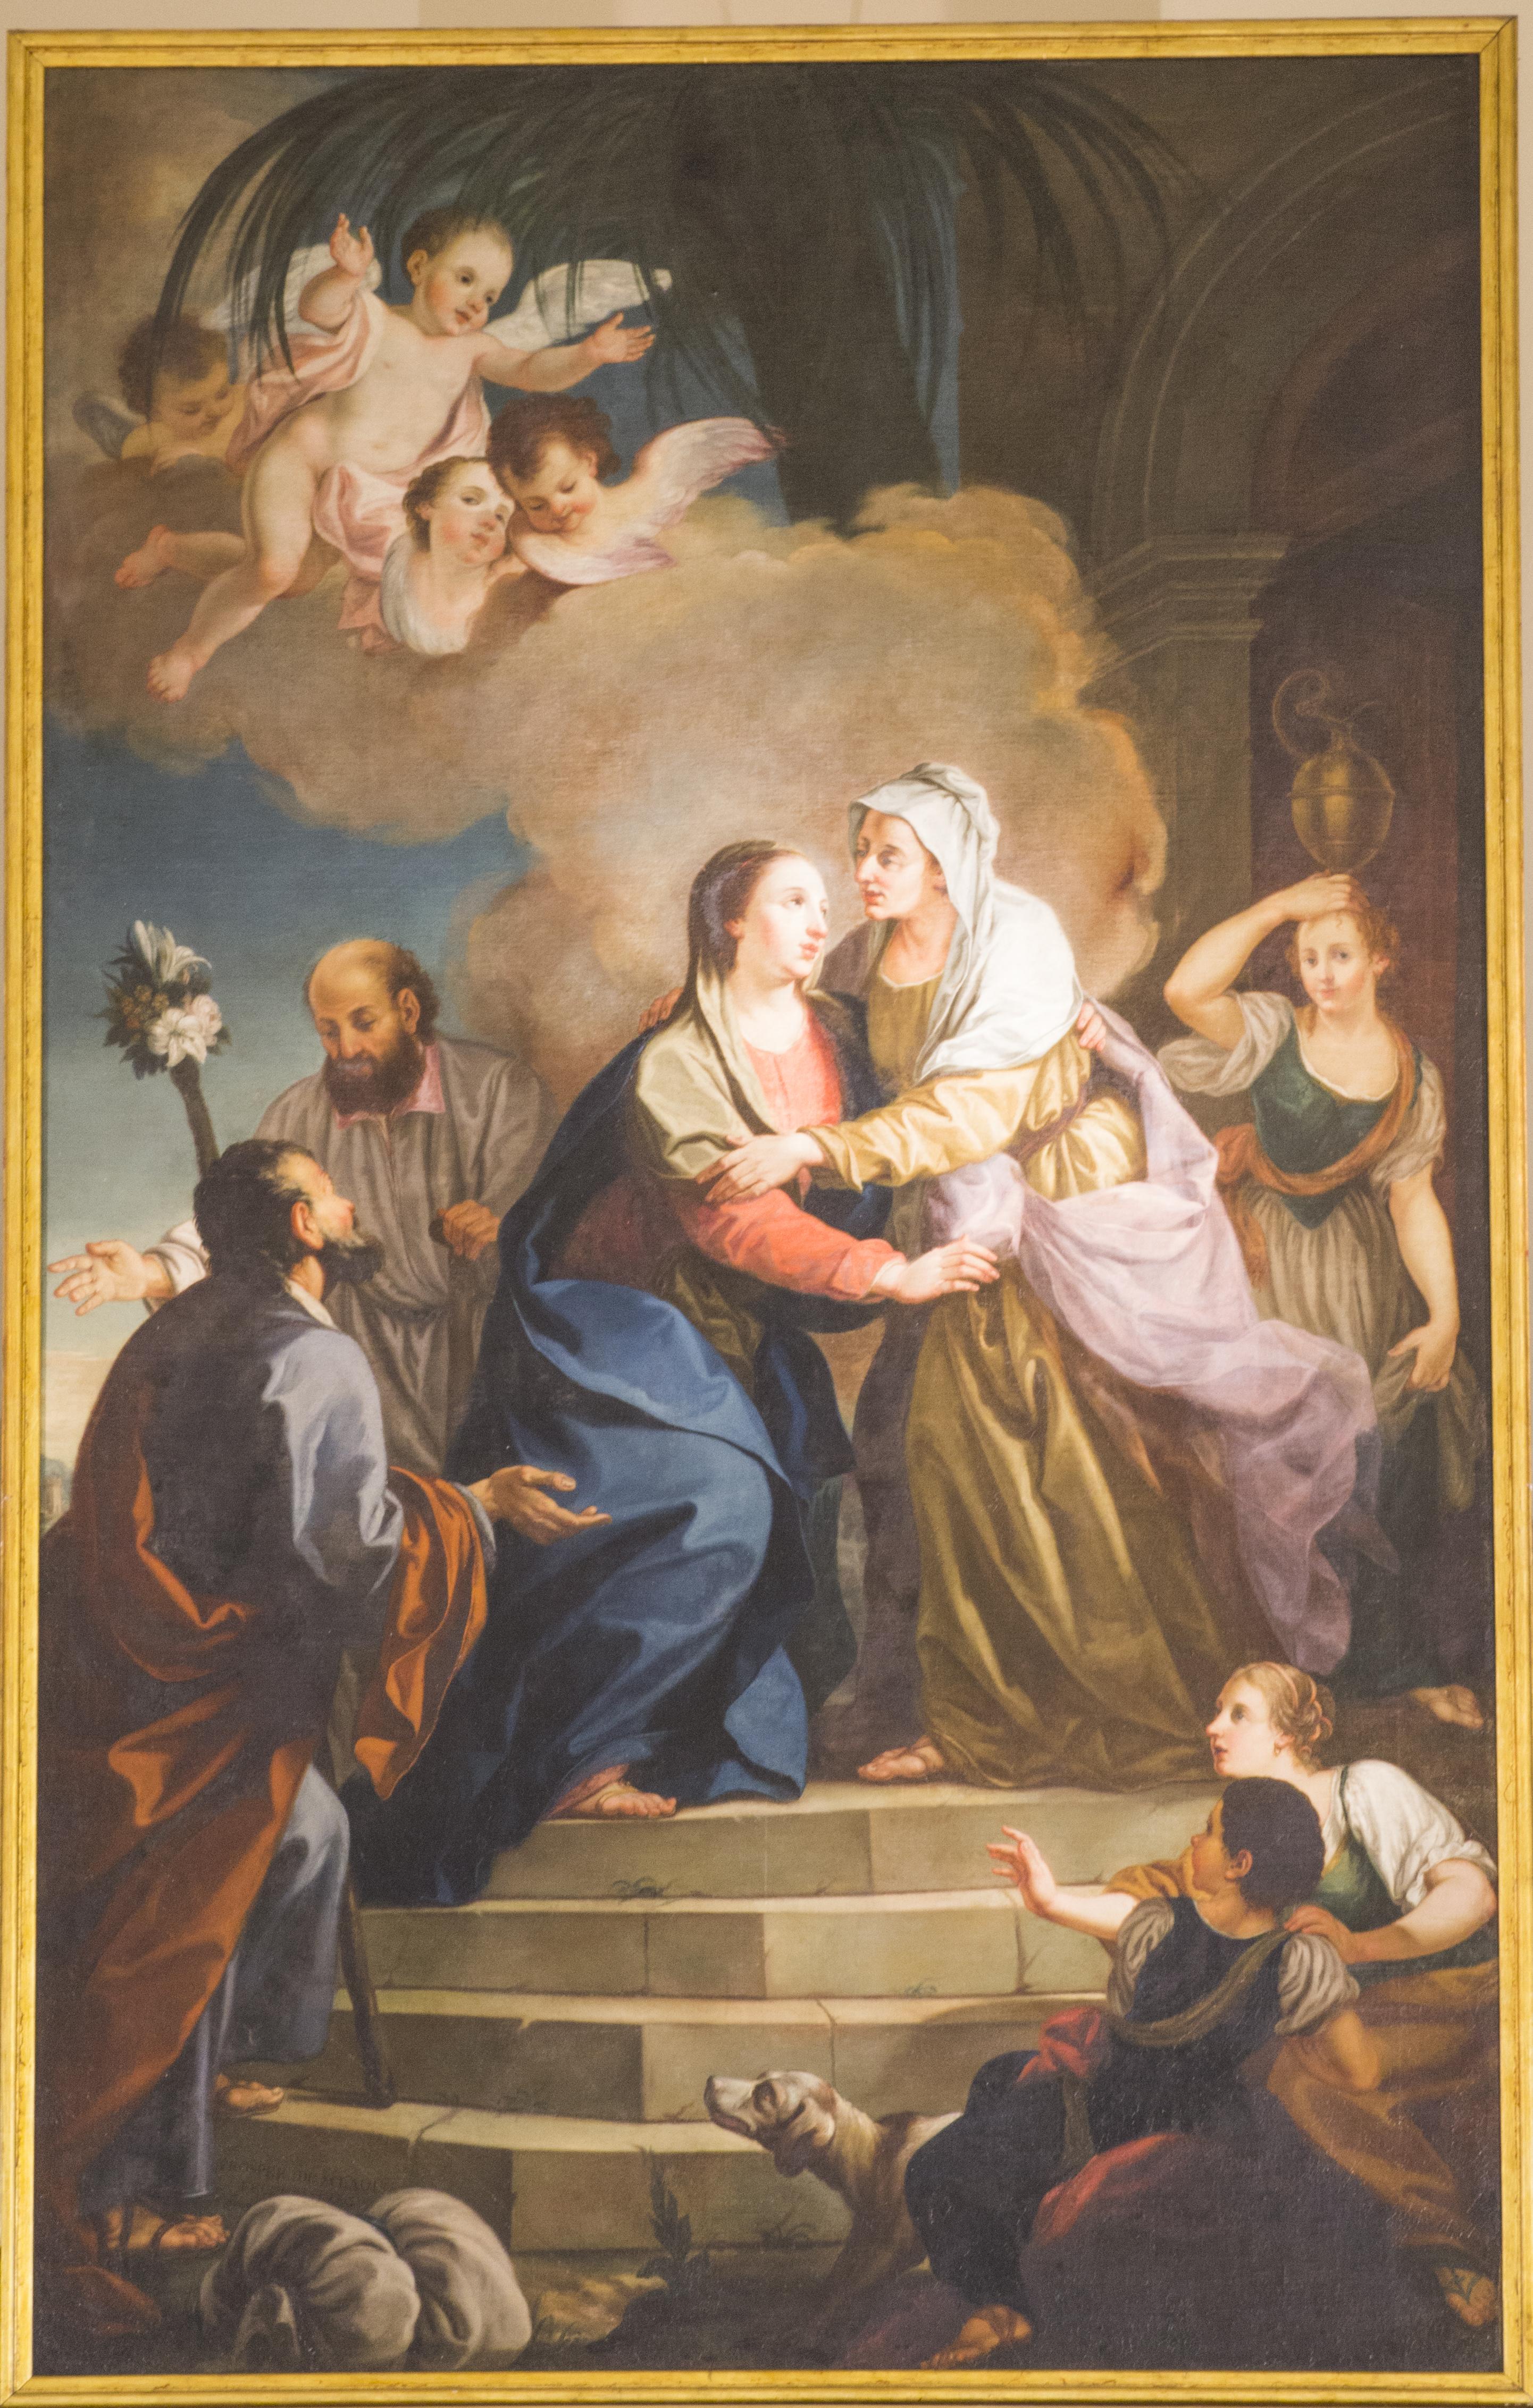 Risultati immagini per maria santissima visita santa elisabetta